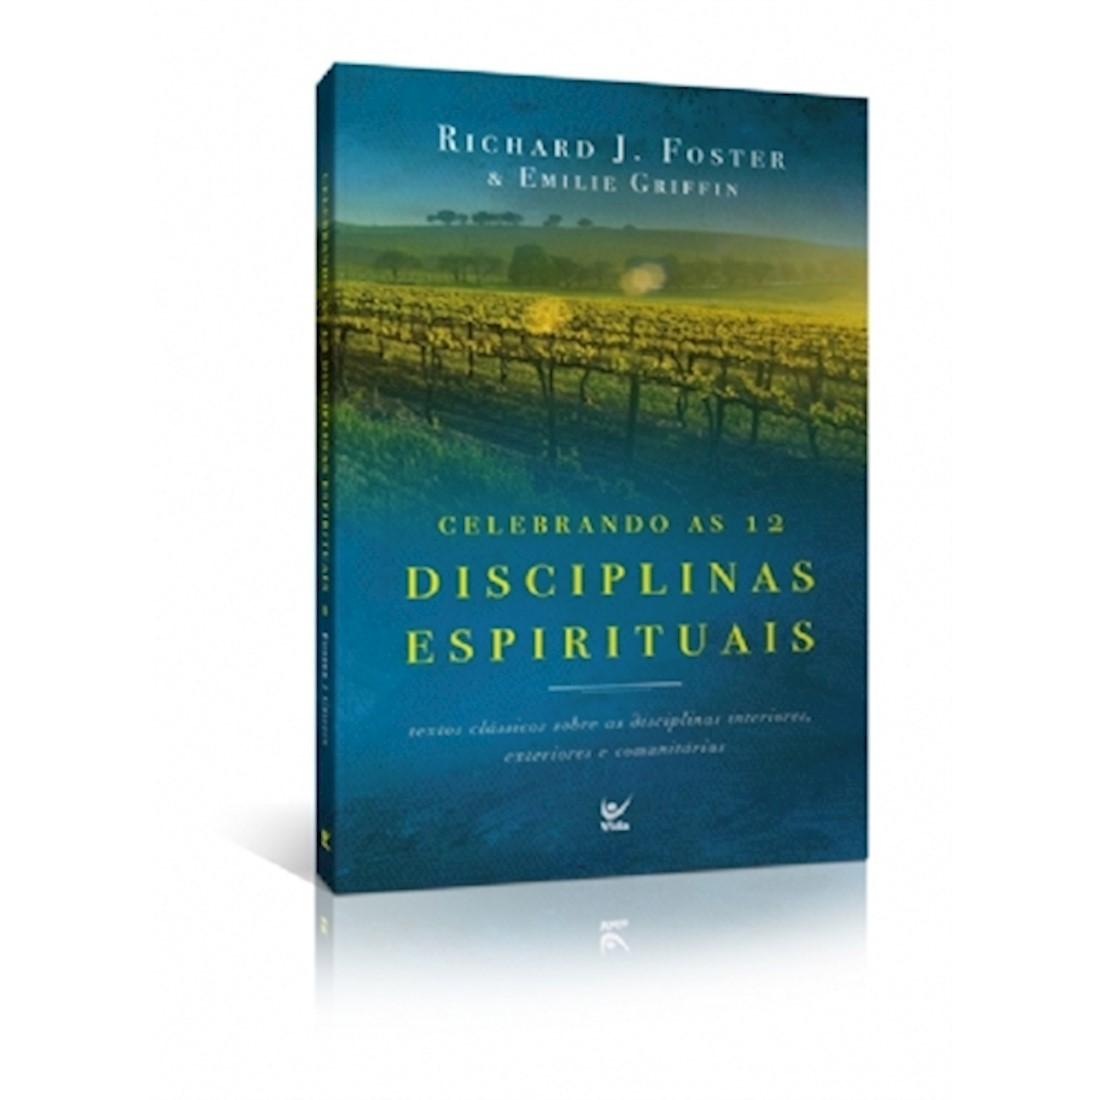 Livro Celebrando As 12 Disciplinas Espirituais